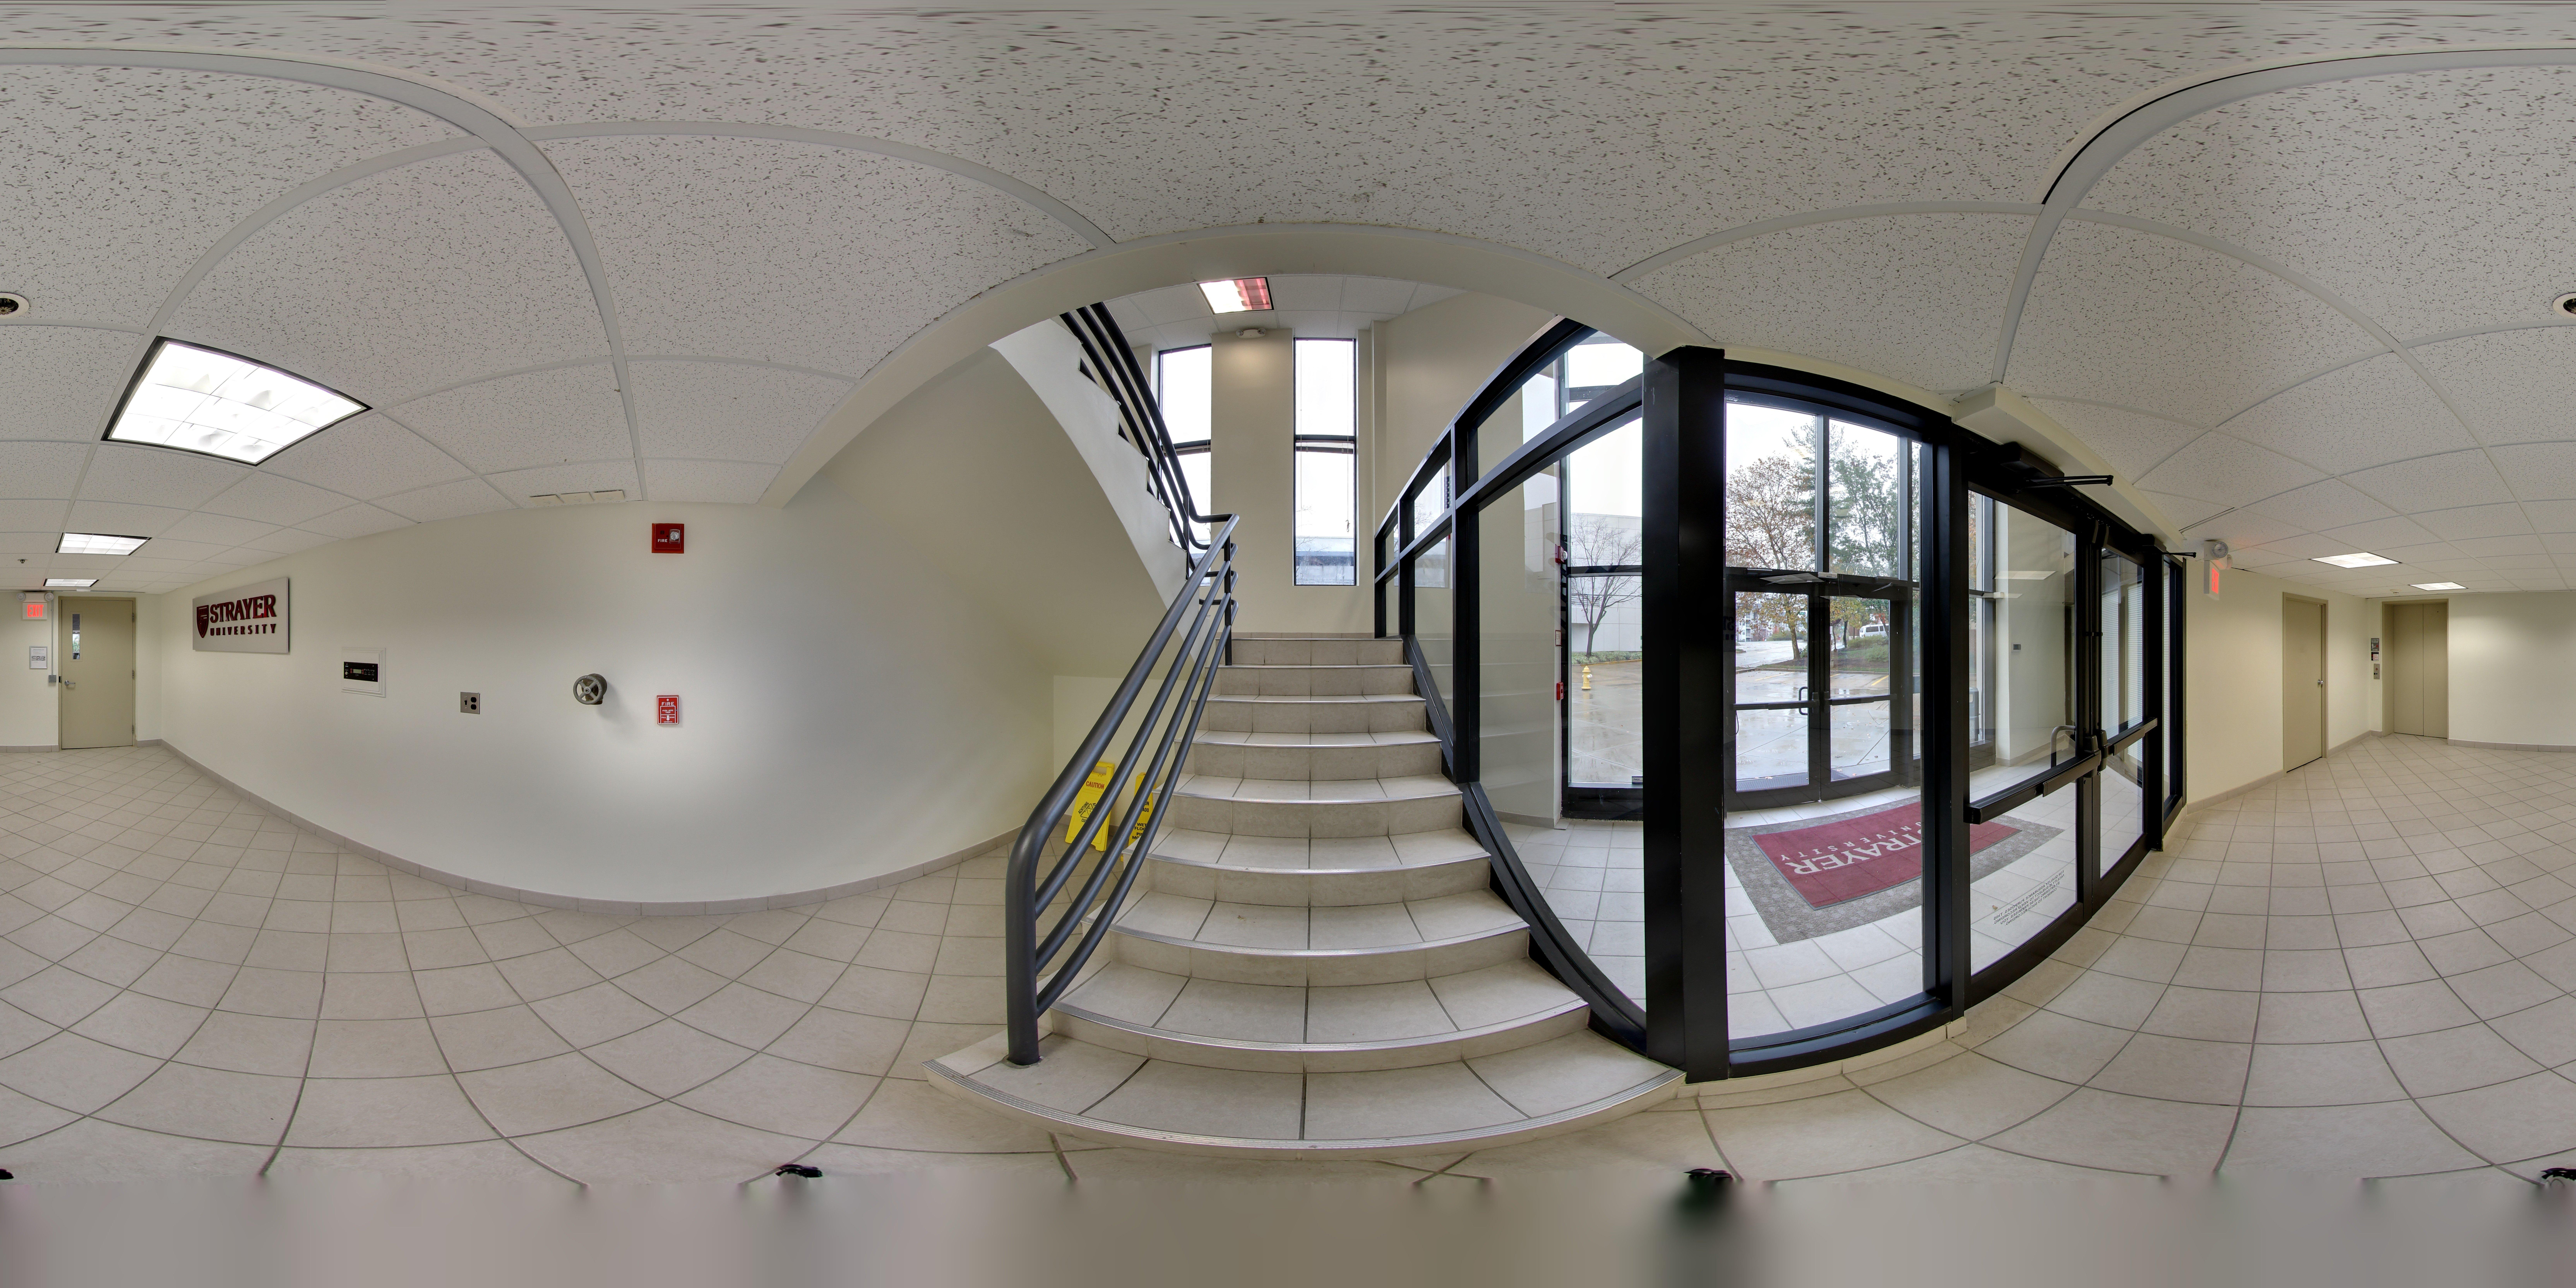 Strayer University image 12